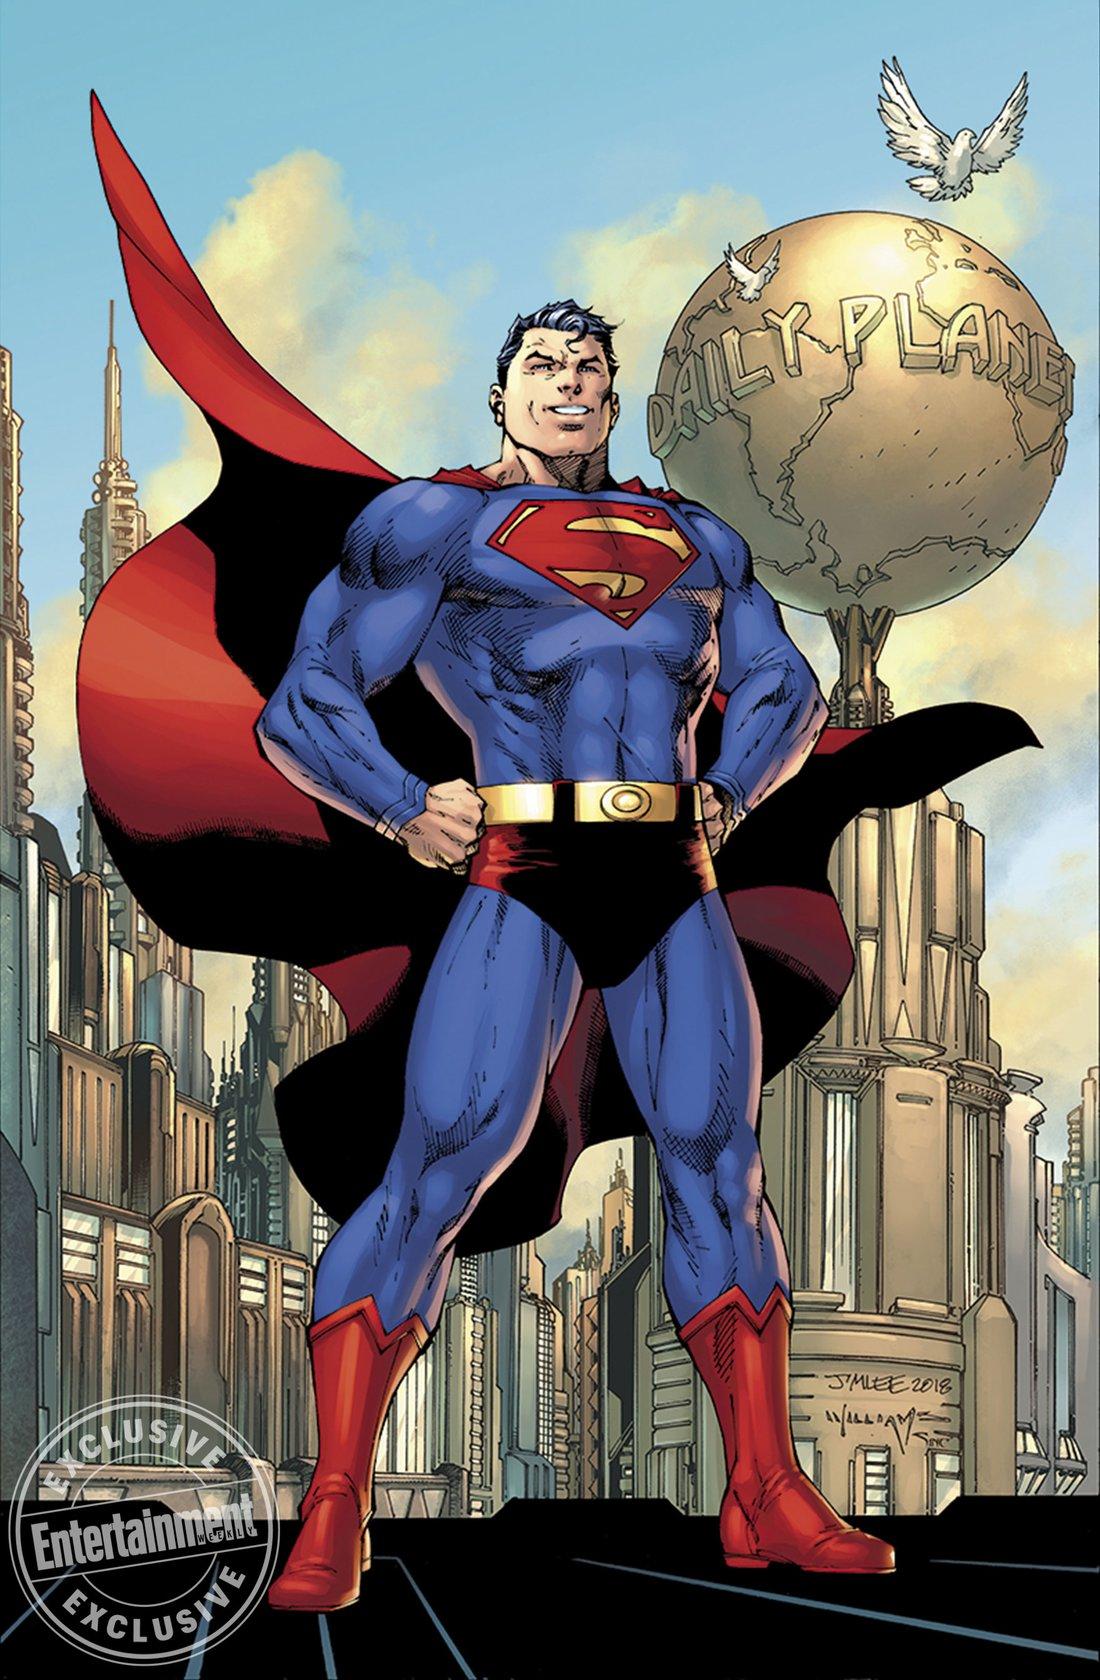 A cueca do Superman sempre é assunto - Action Comics #1000 - Jim Lee